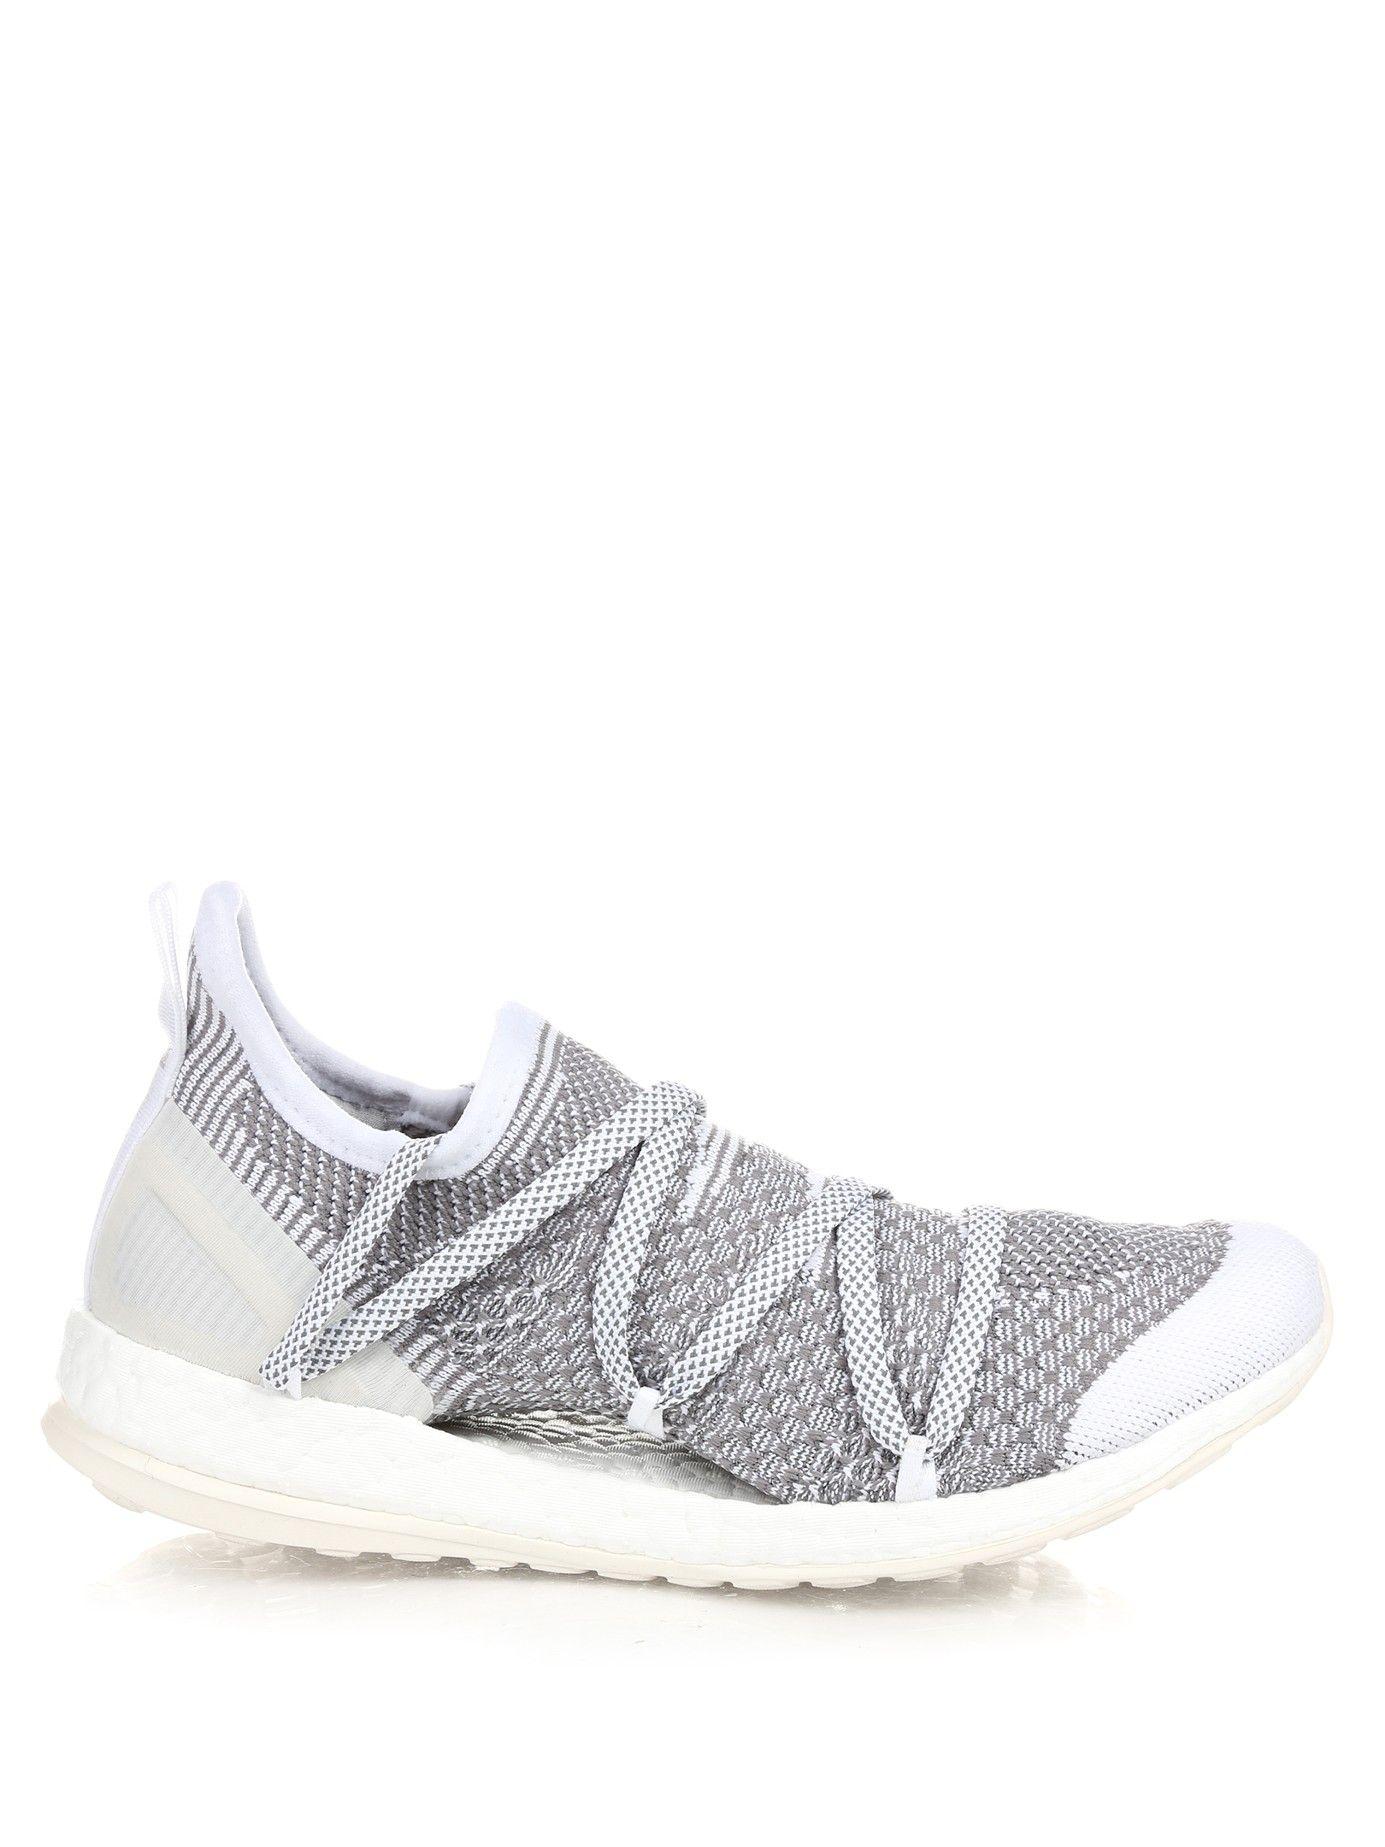 Adidas Par Stella Mccartney Pureboostx Bas-tops Et Chaussures De Sport QAJr6Umm